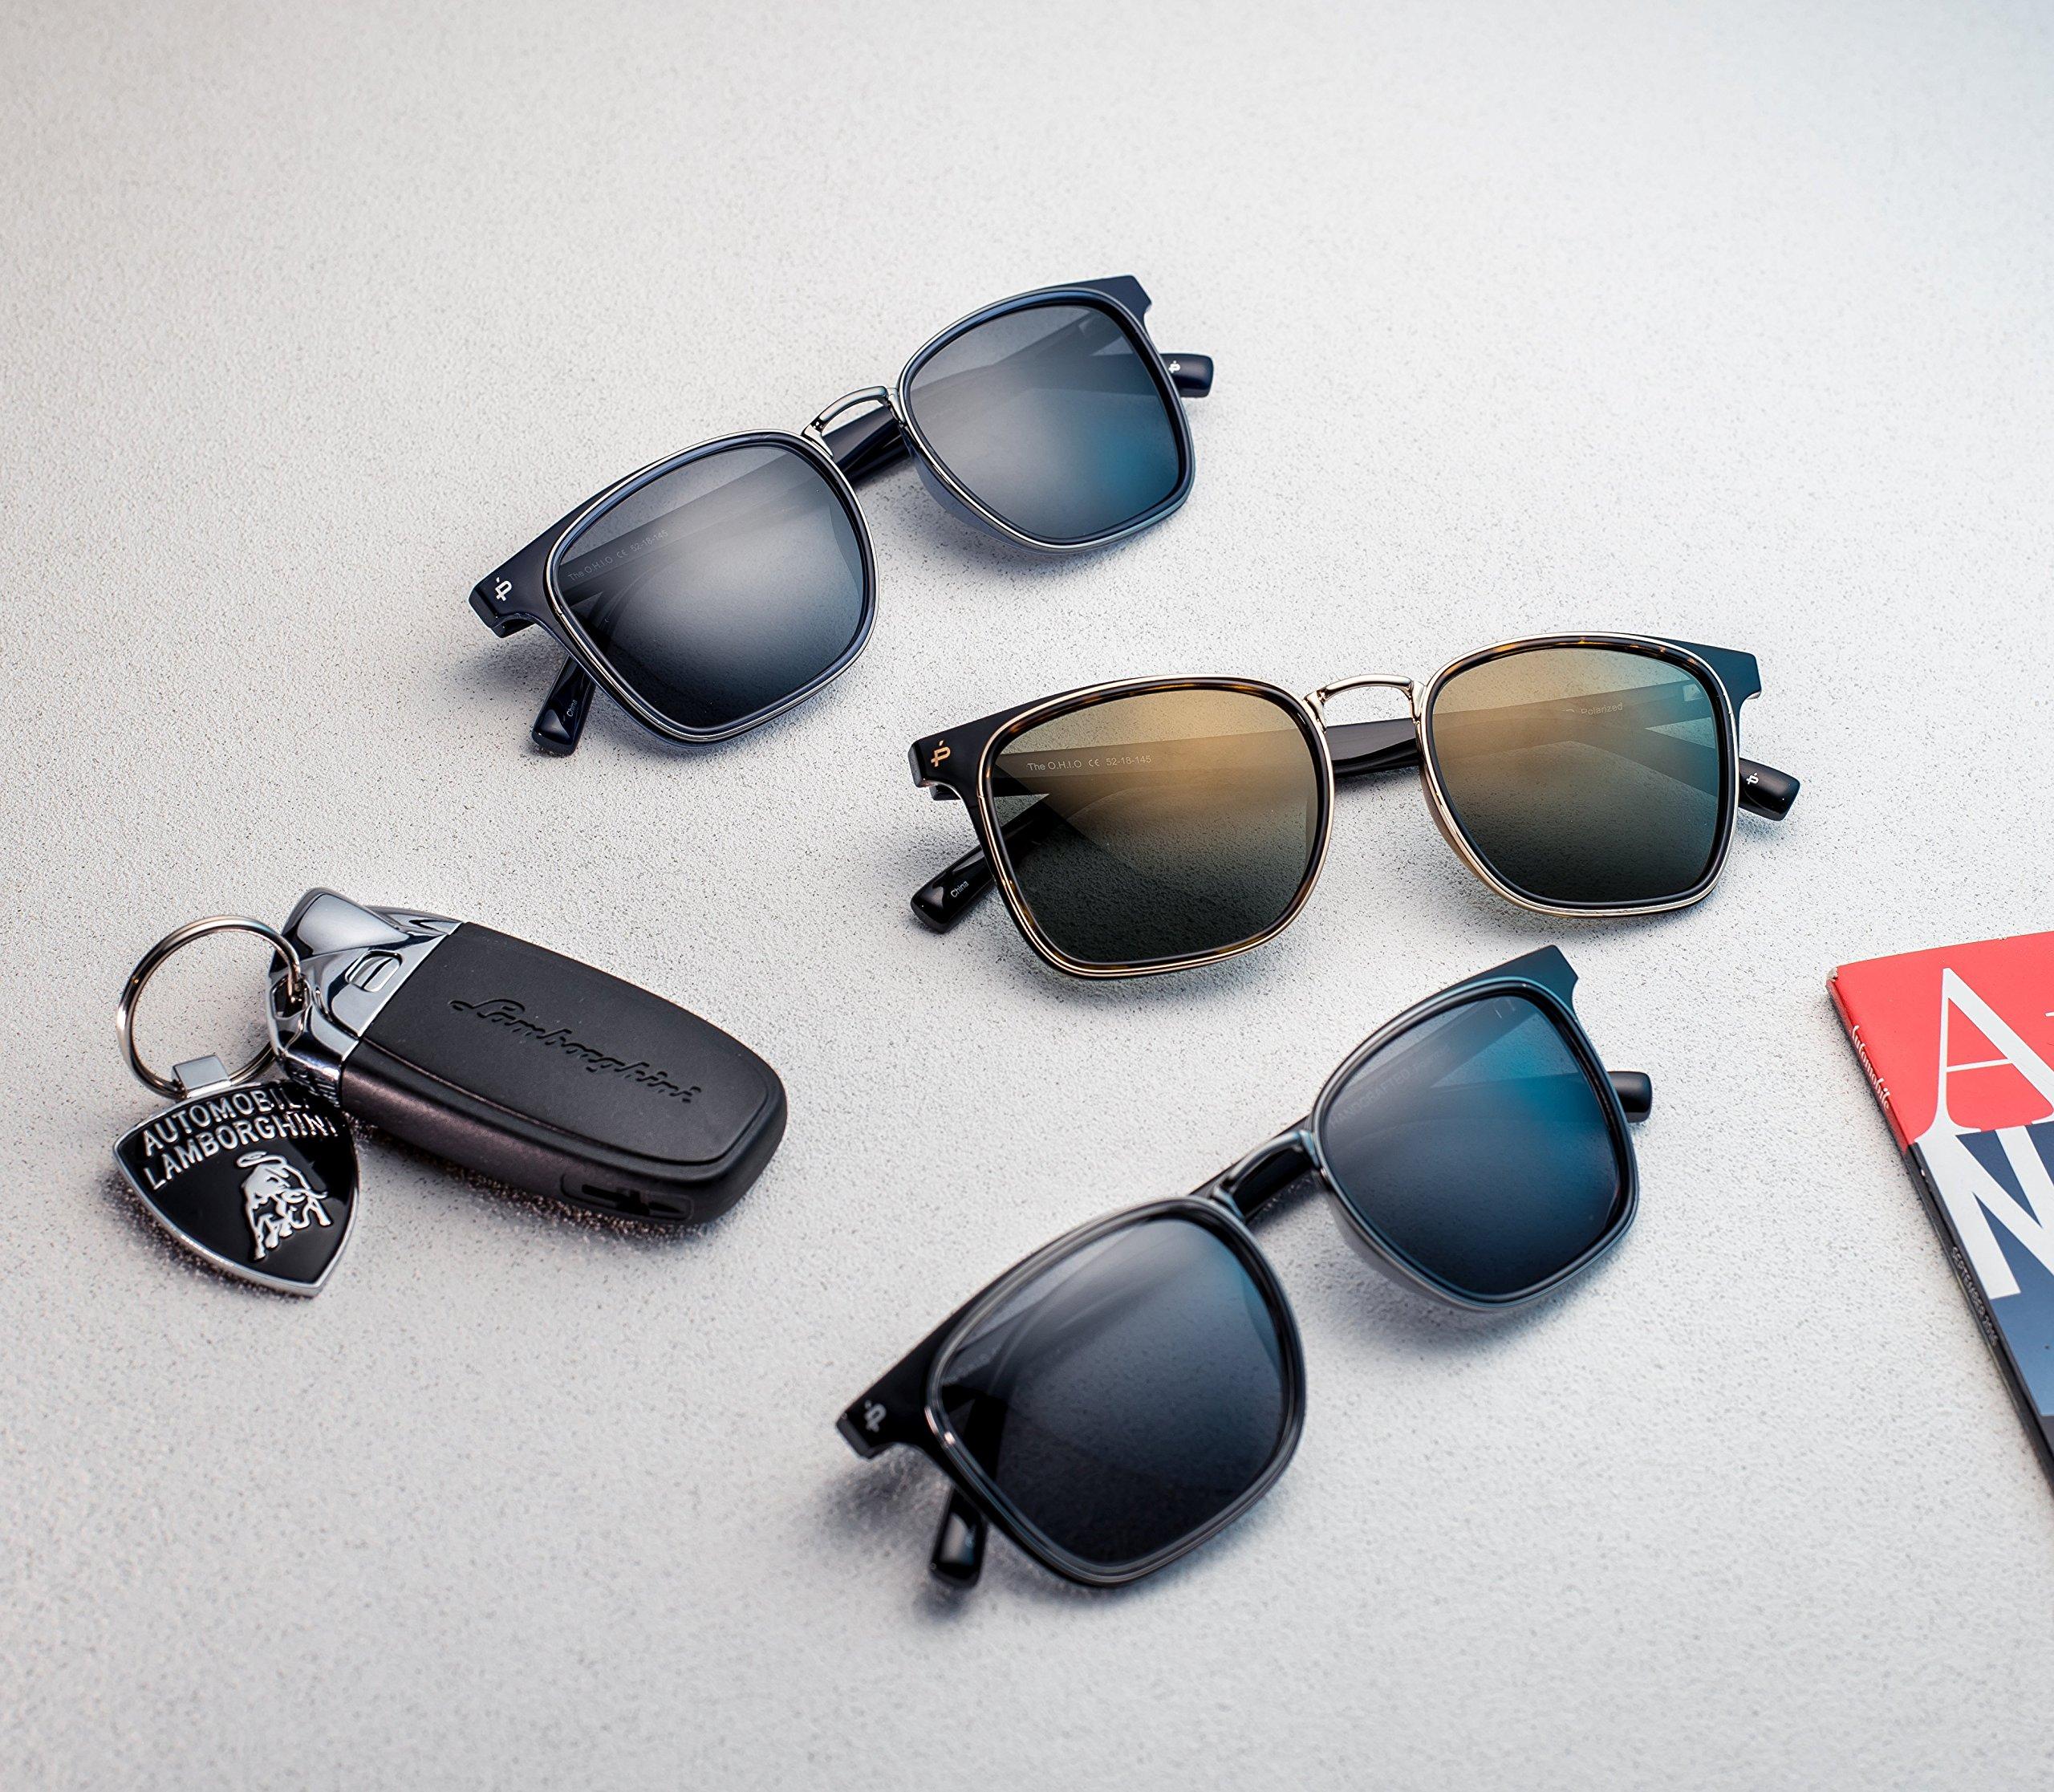 PRIVÉ REVAUX Places We Love Collection''The O.H.I.O'' Polarized Designer Square Sunglasses RandM Colab by PRIVÉ REVAUX (Image #3)